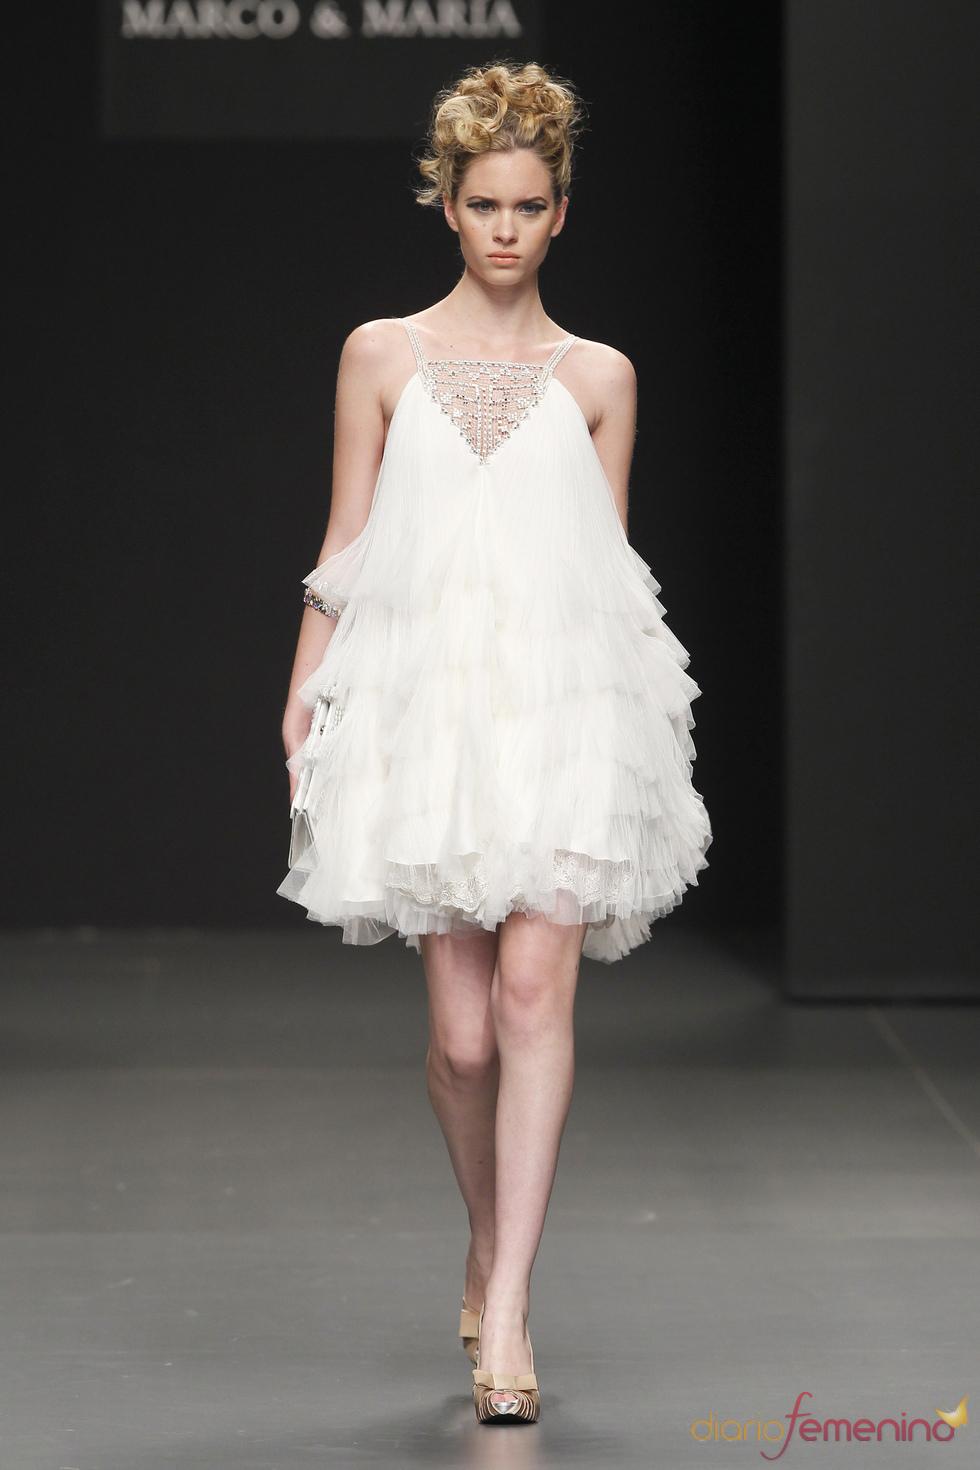 Vestido de novia con volumen, de M&M